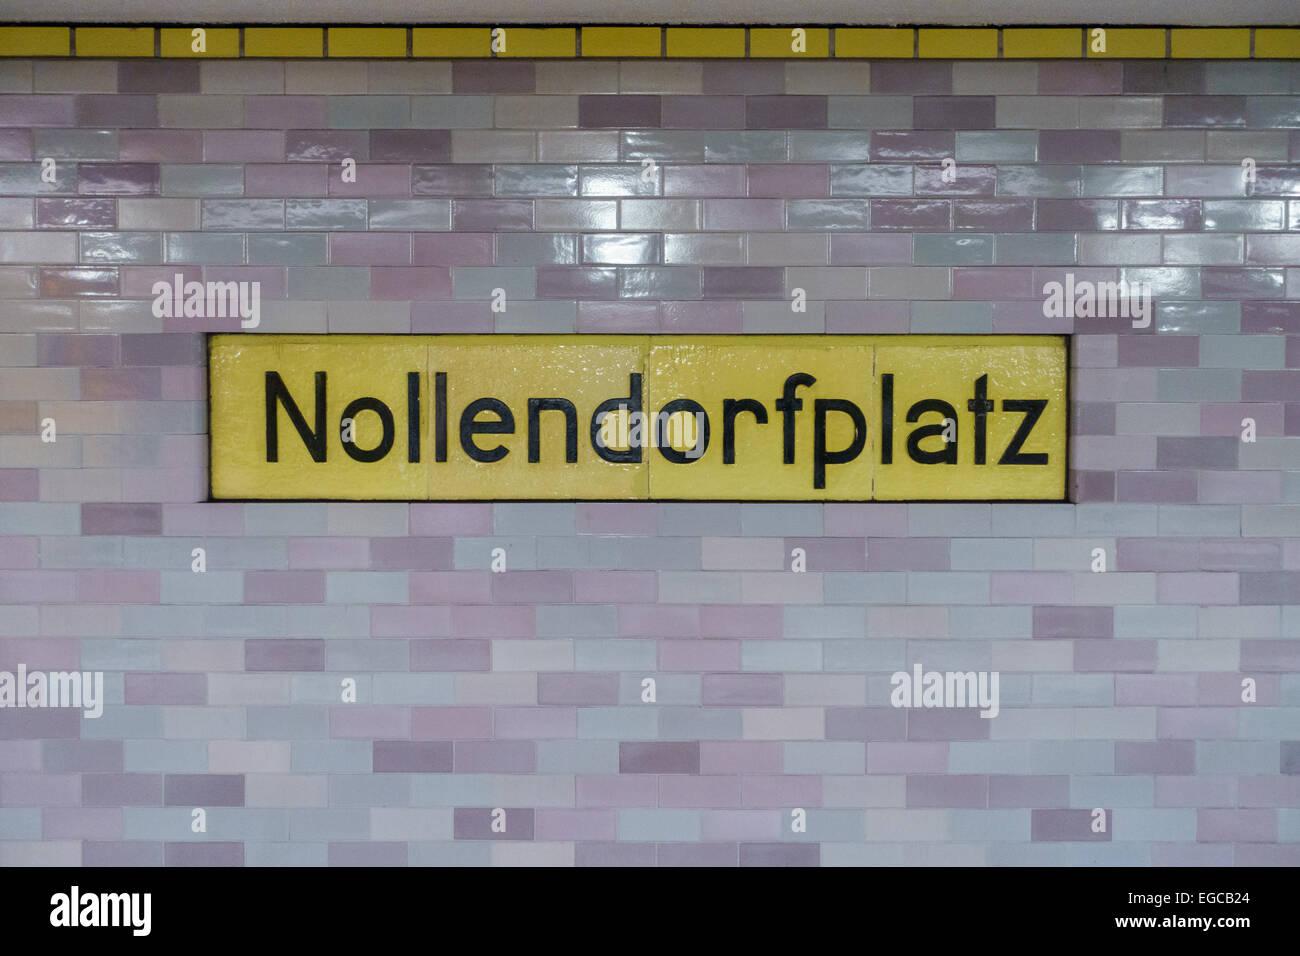 nollendorfplatz u bahn schild in berlin deutschland stockfoto bild 78948076 alamy. Black Bedroom Furniture Sets. Home Design Ideas